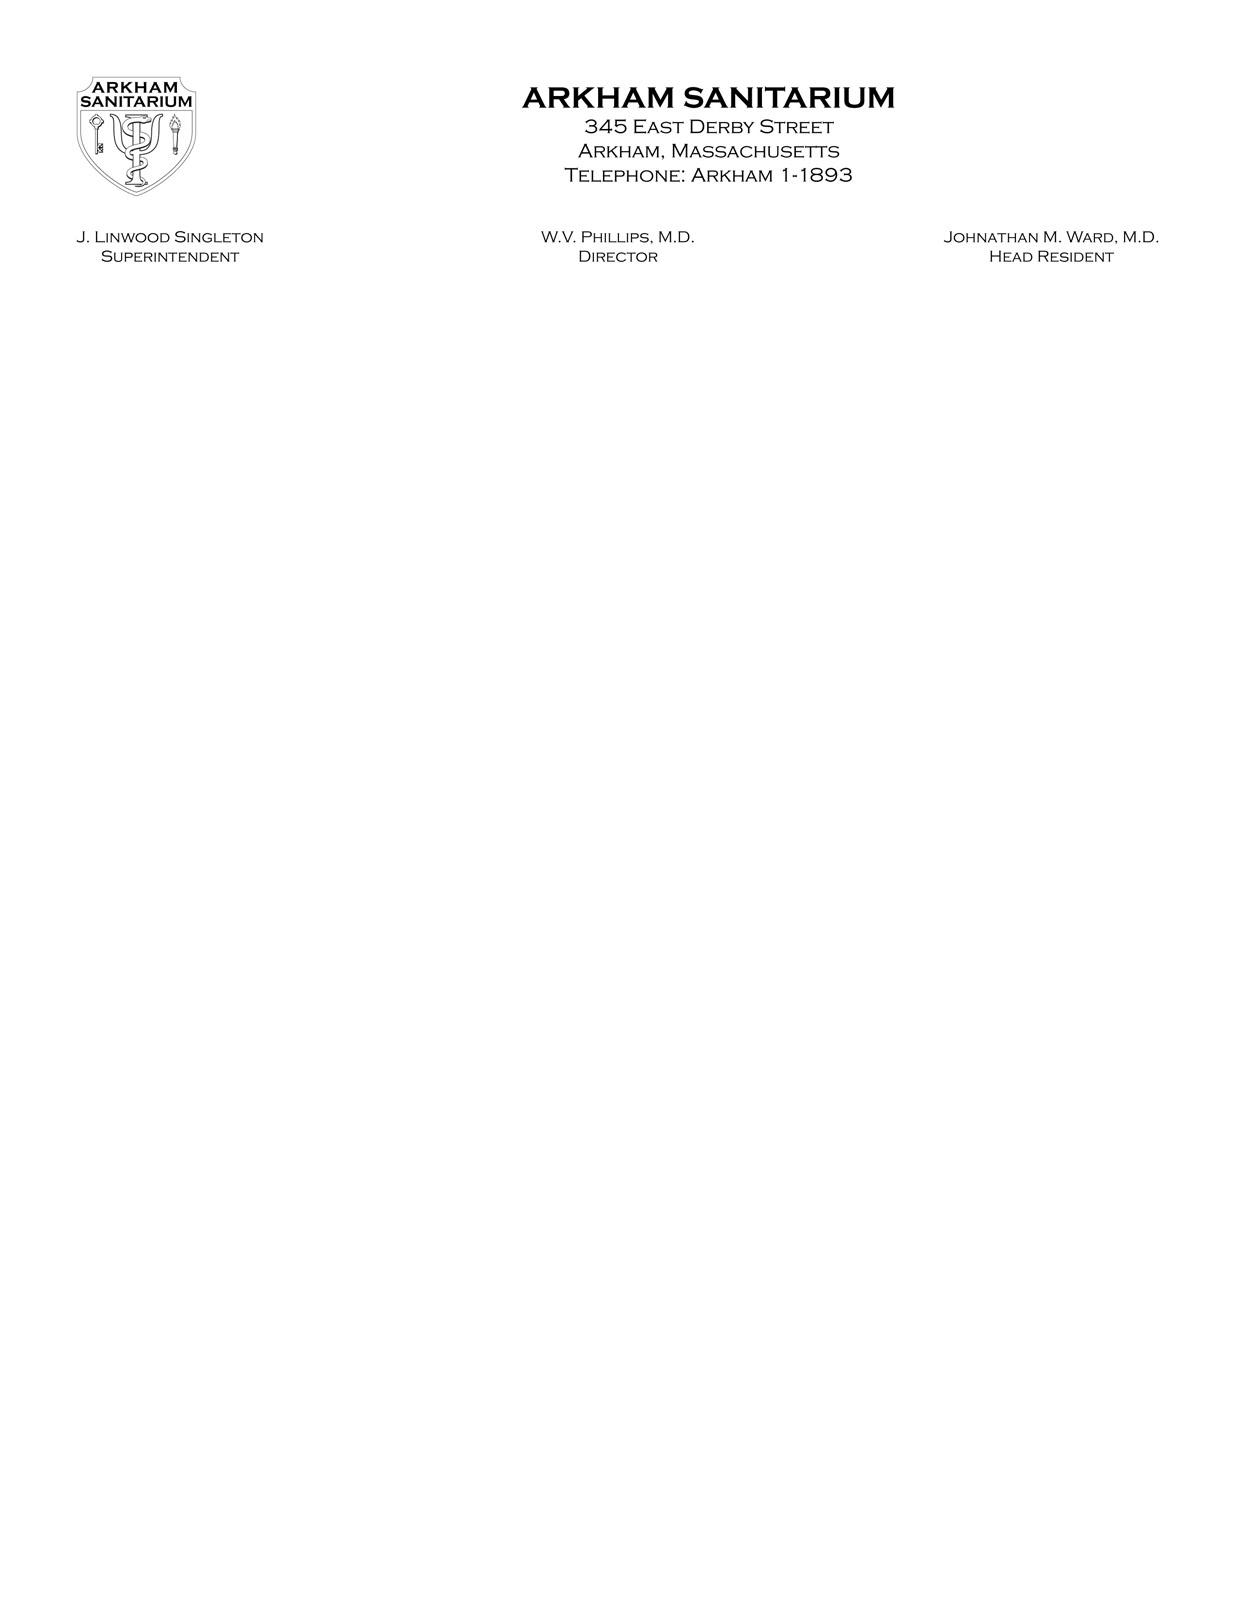 resume letterhead examples resume letterhead examples 1719